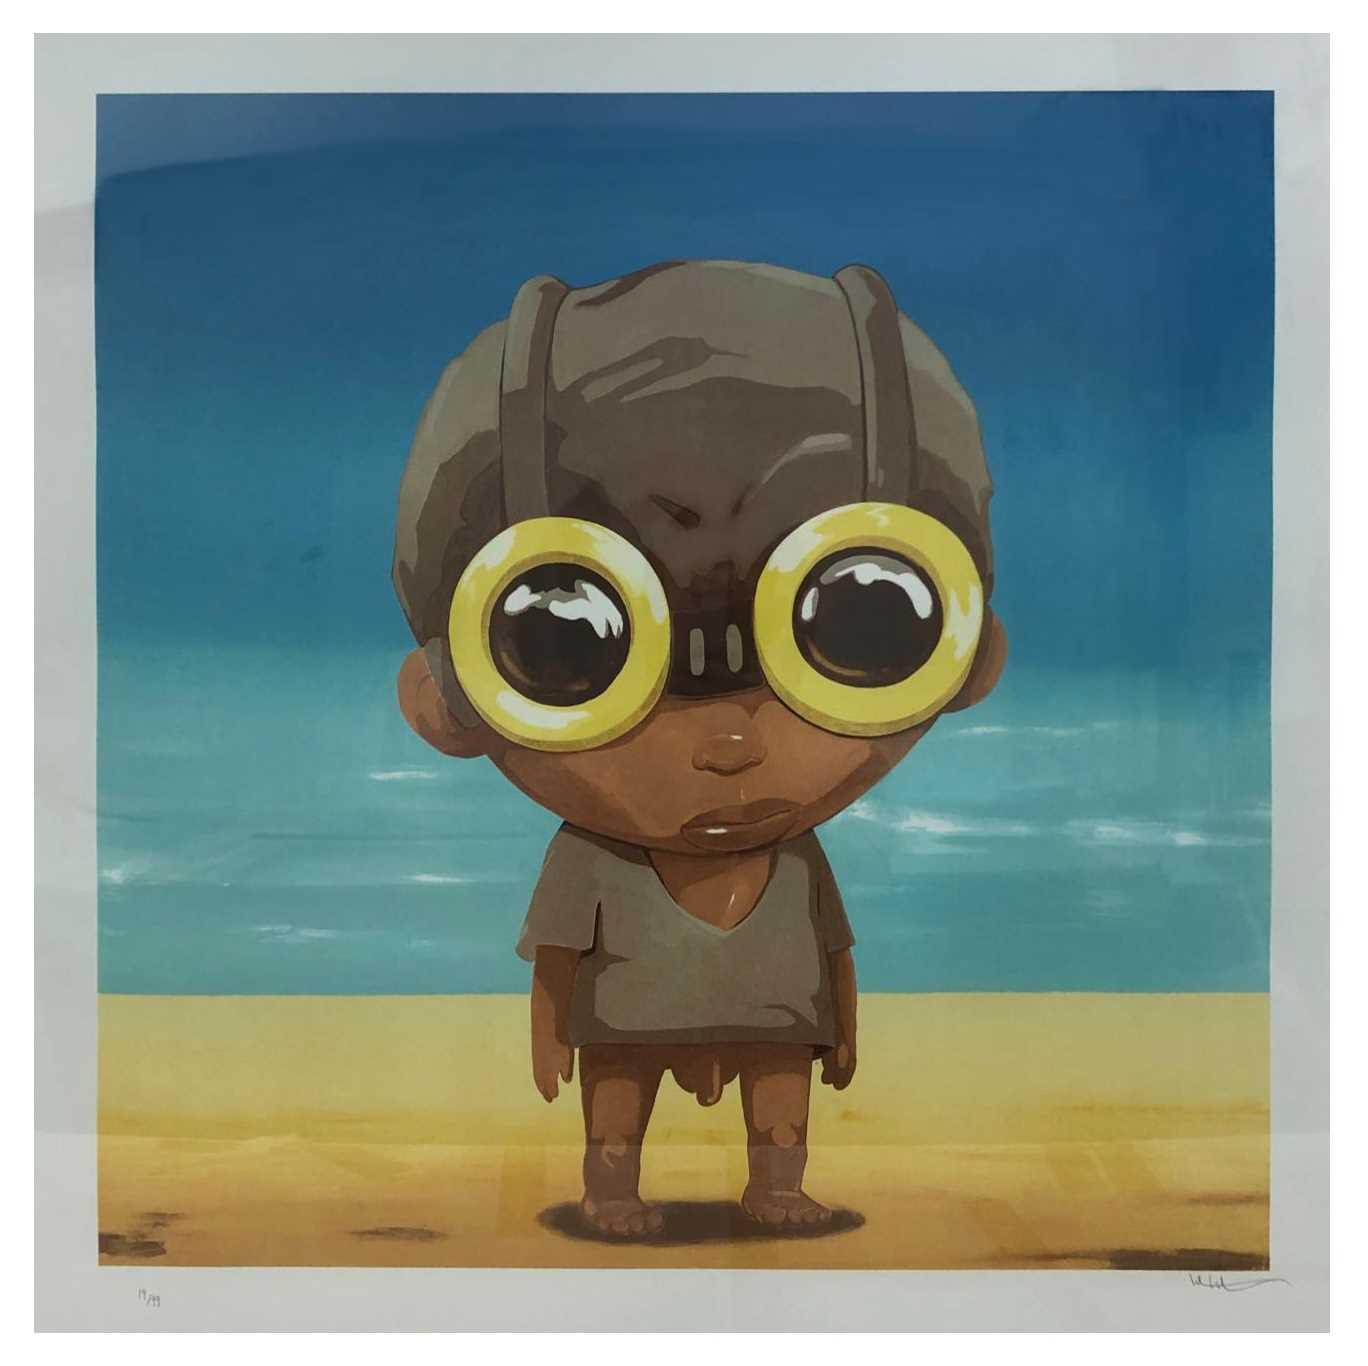 Lot 57 - Hebru Brantley (American 1981-), Little Big Head, 2020